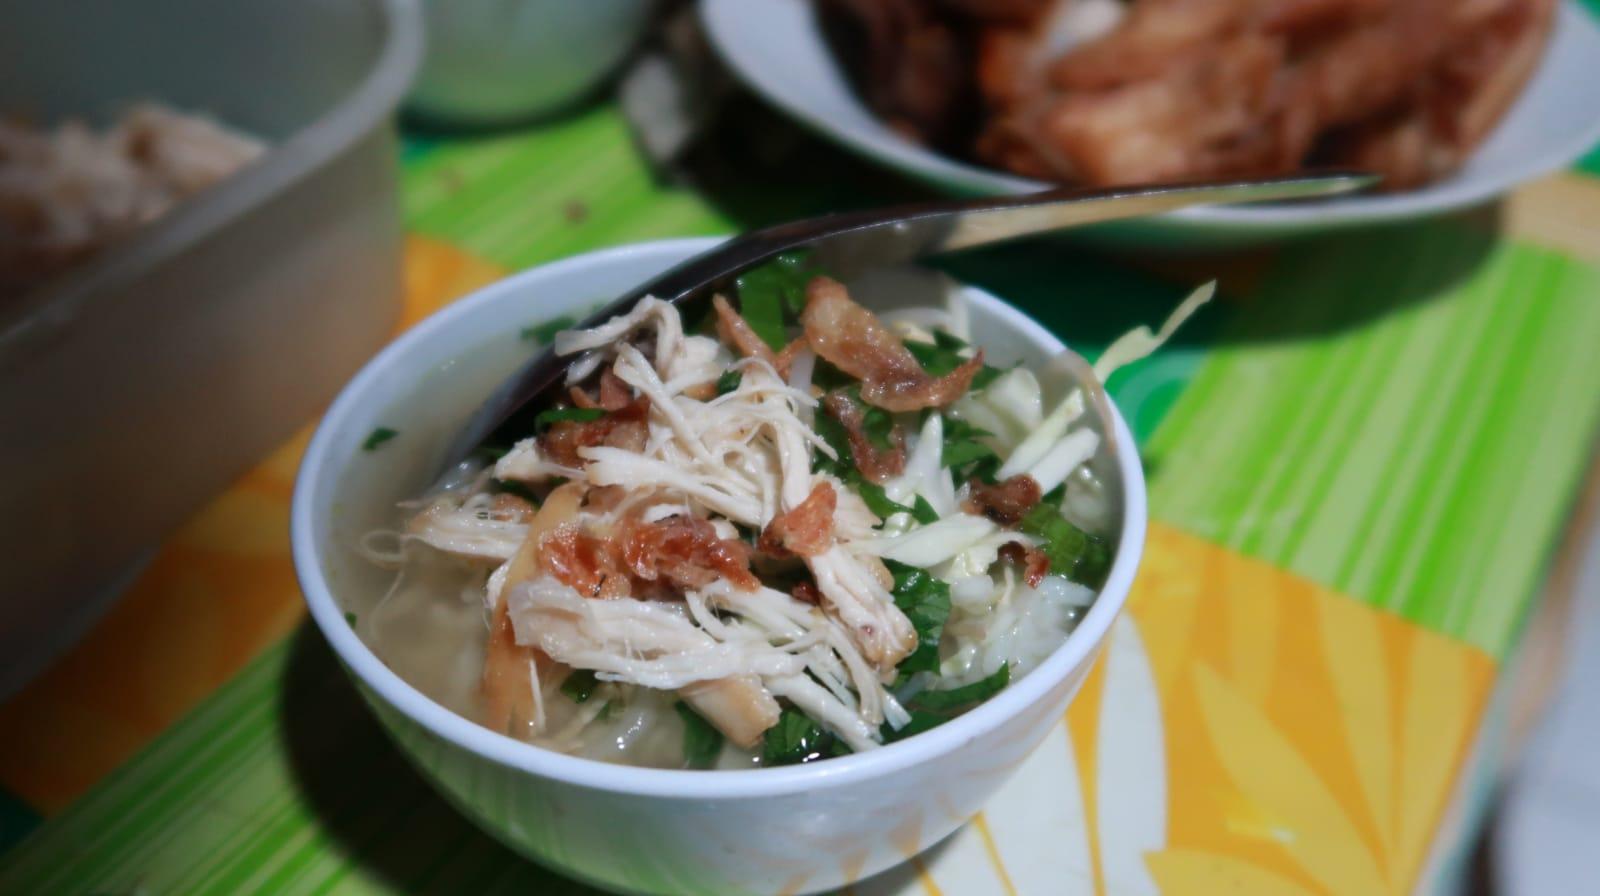 Kuliner Soto Termurah seKabupaten Rembang, Harga Cuma Rp. 1000